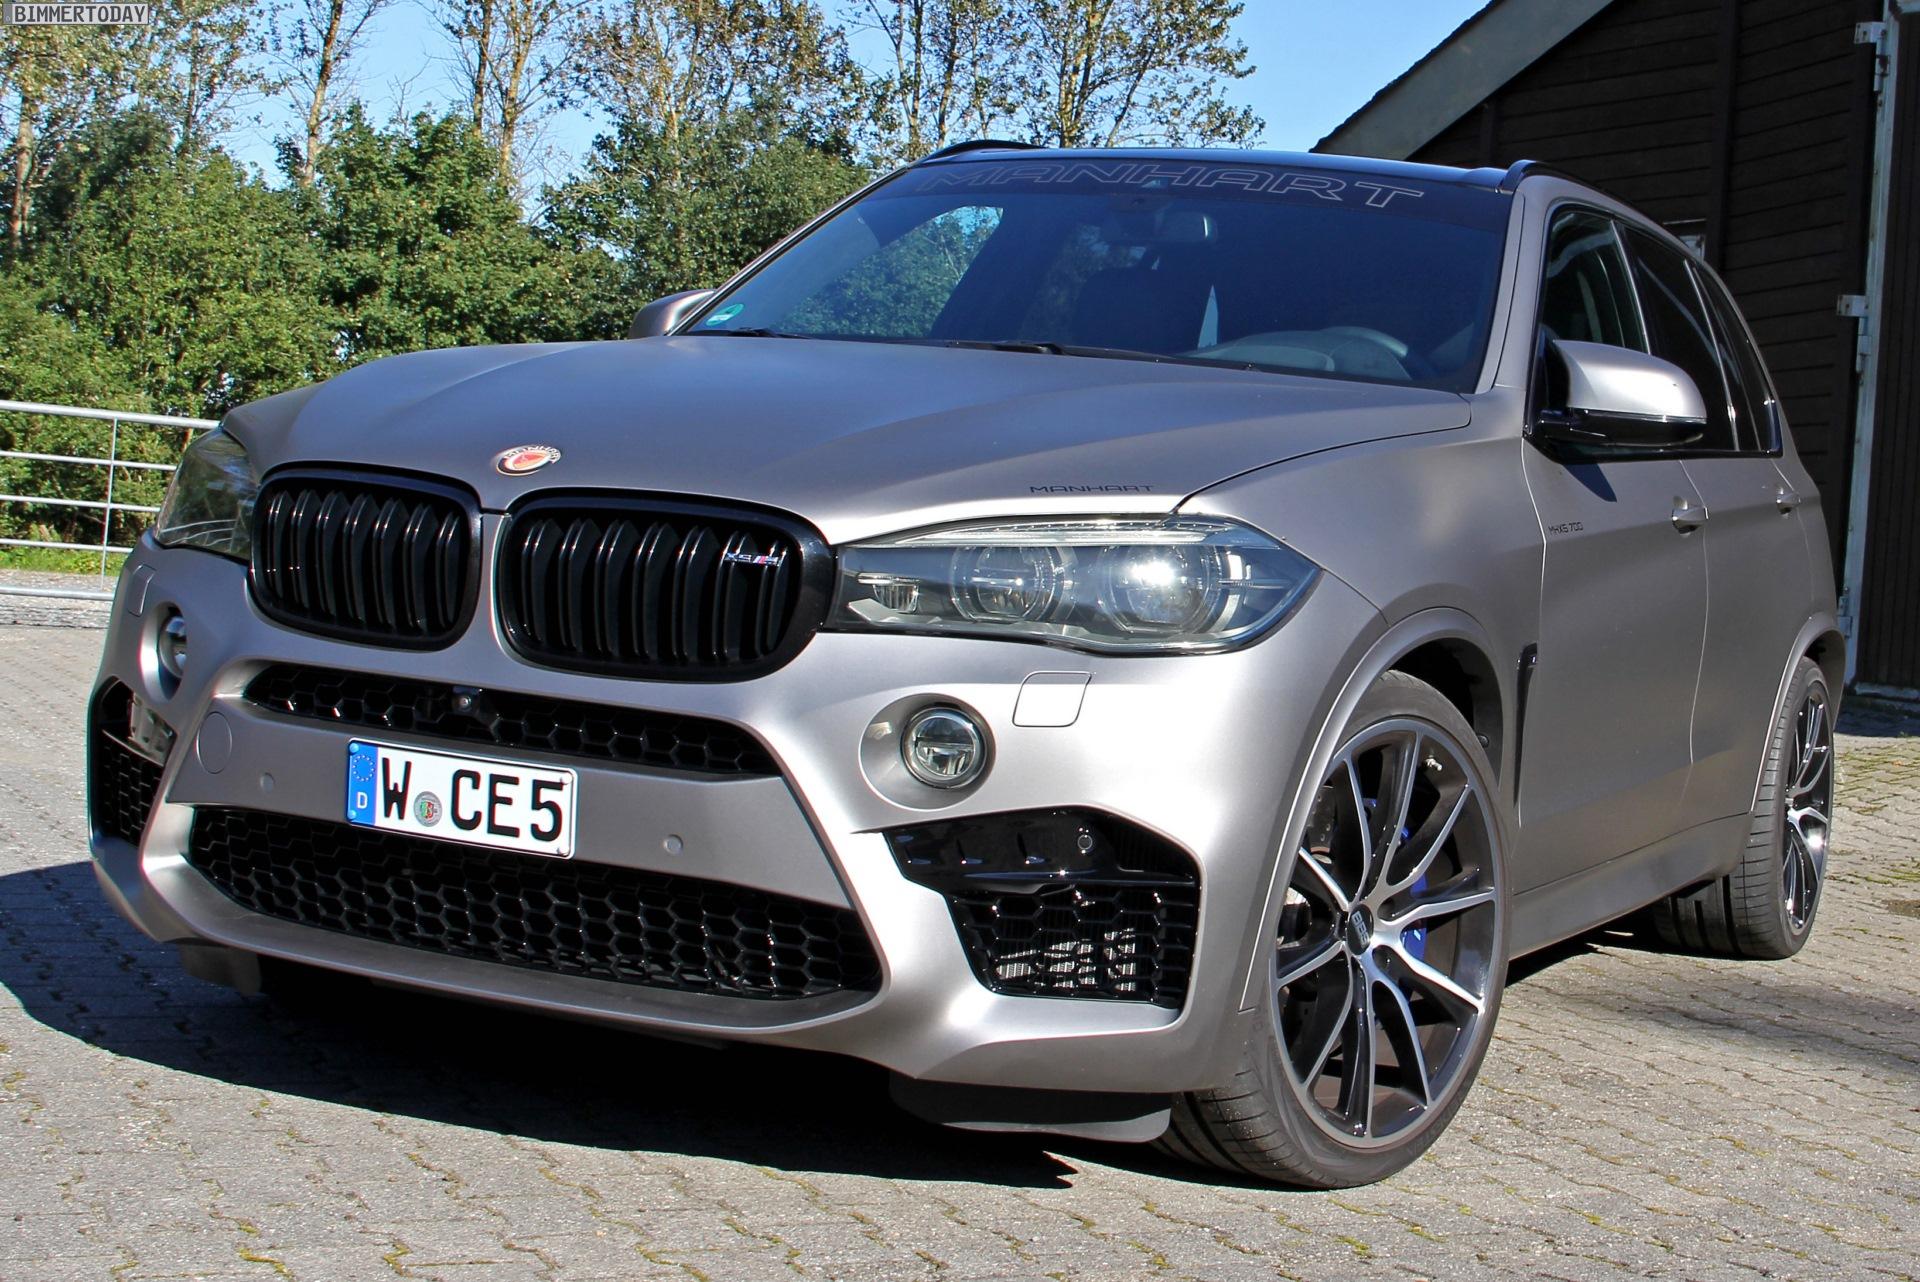 Manhart-MHX5-700-BMW-X5-M-Tuning-01